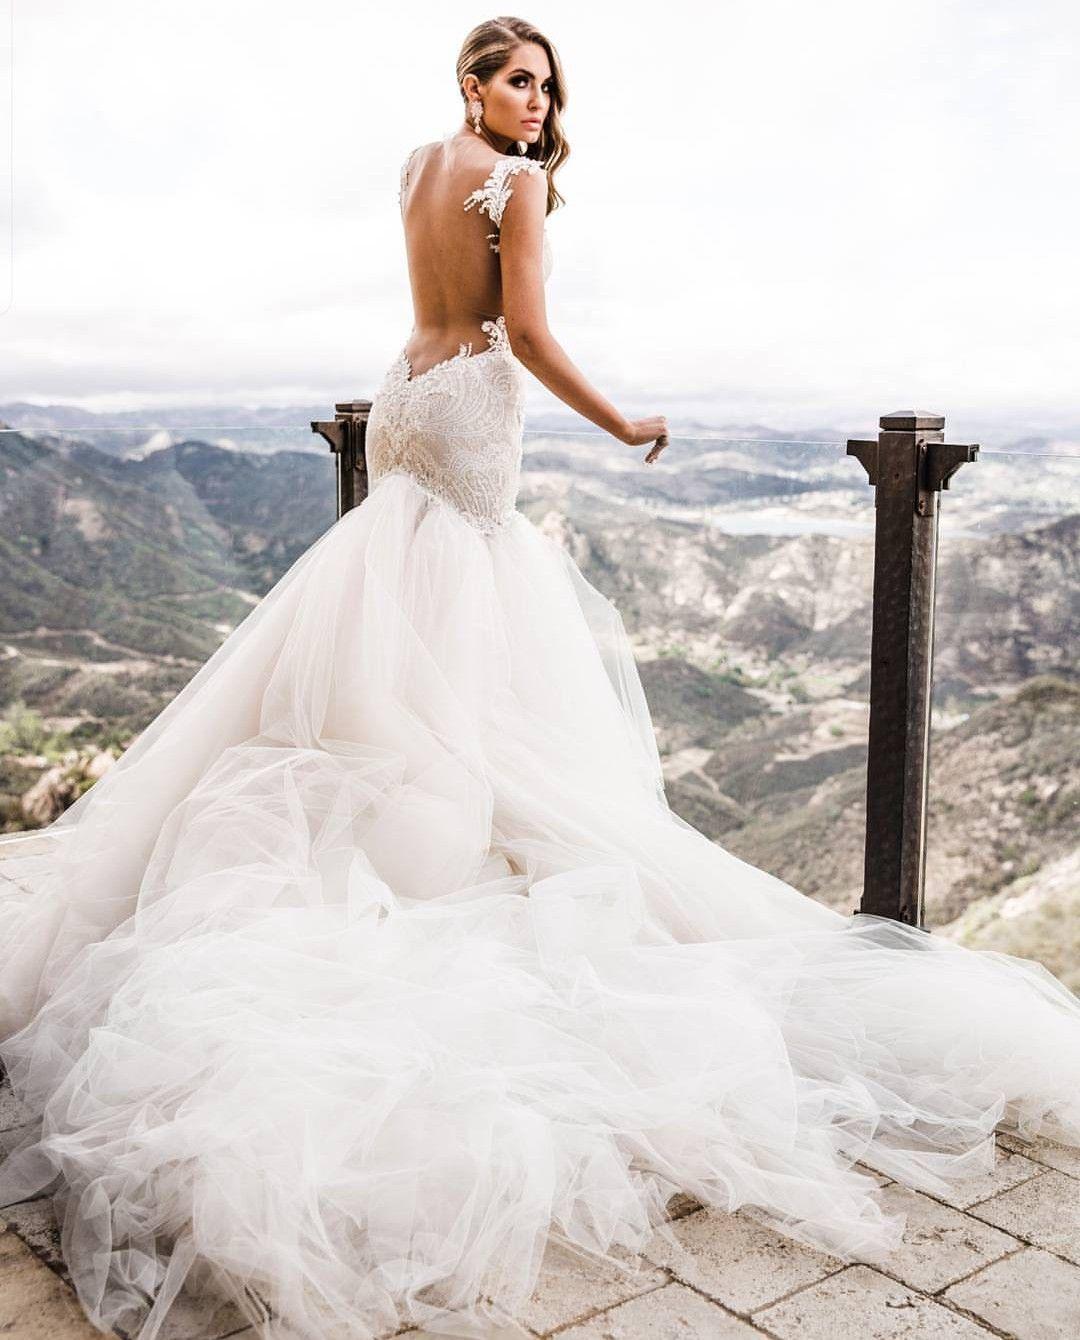 Galia Lahav Loretta Size 8 In 2020 Ball Gowns Wedding Backless Wedding Wedding Dresses